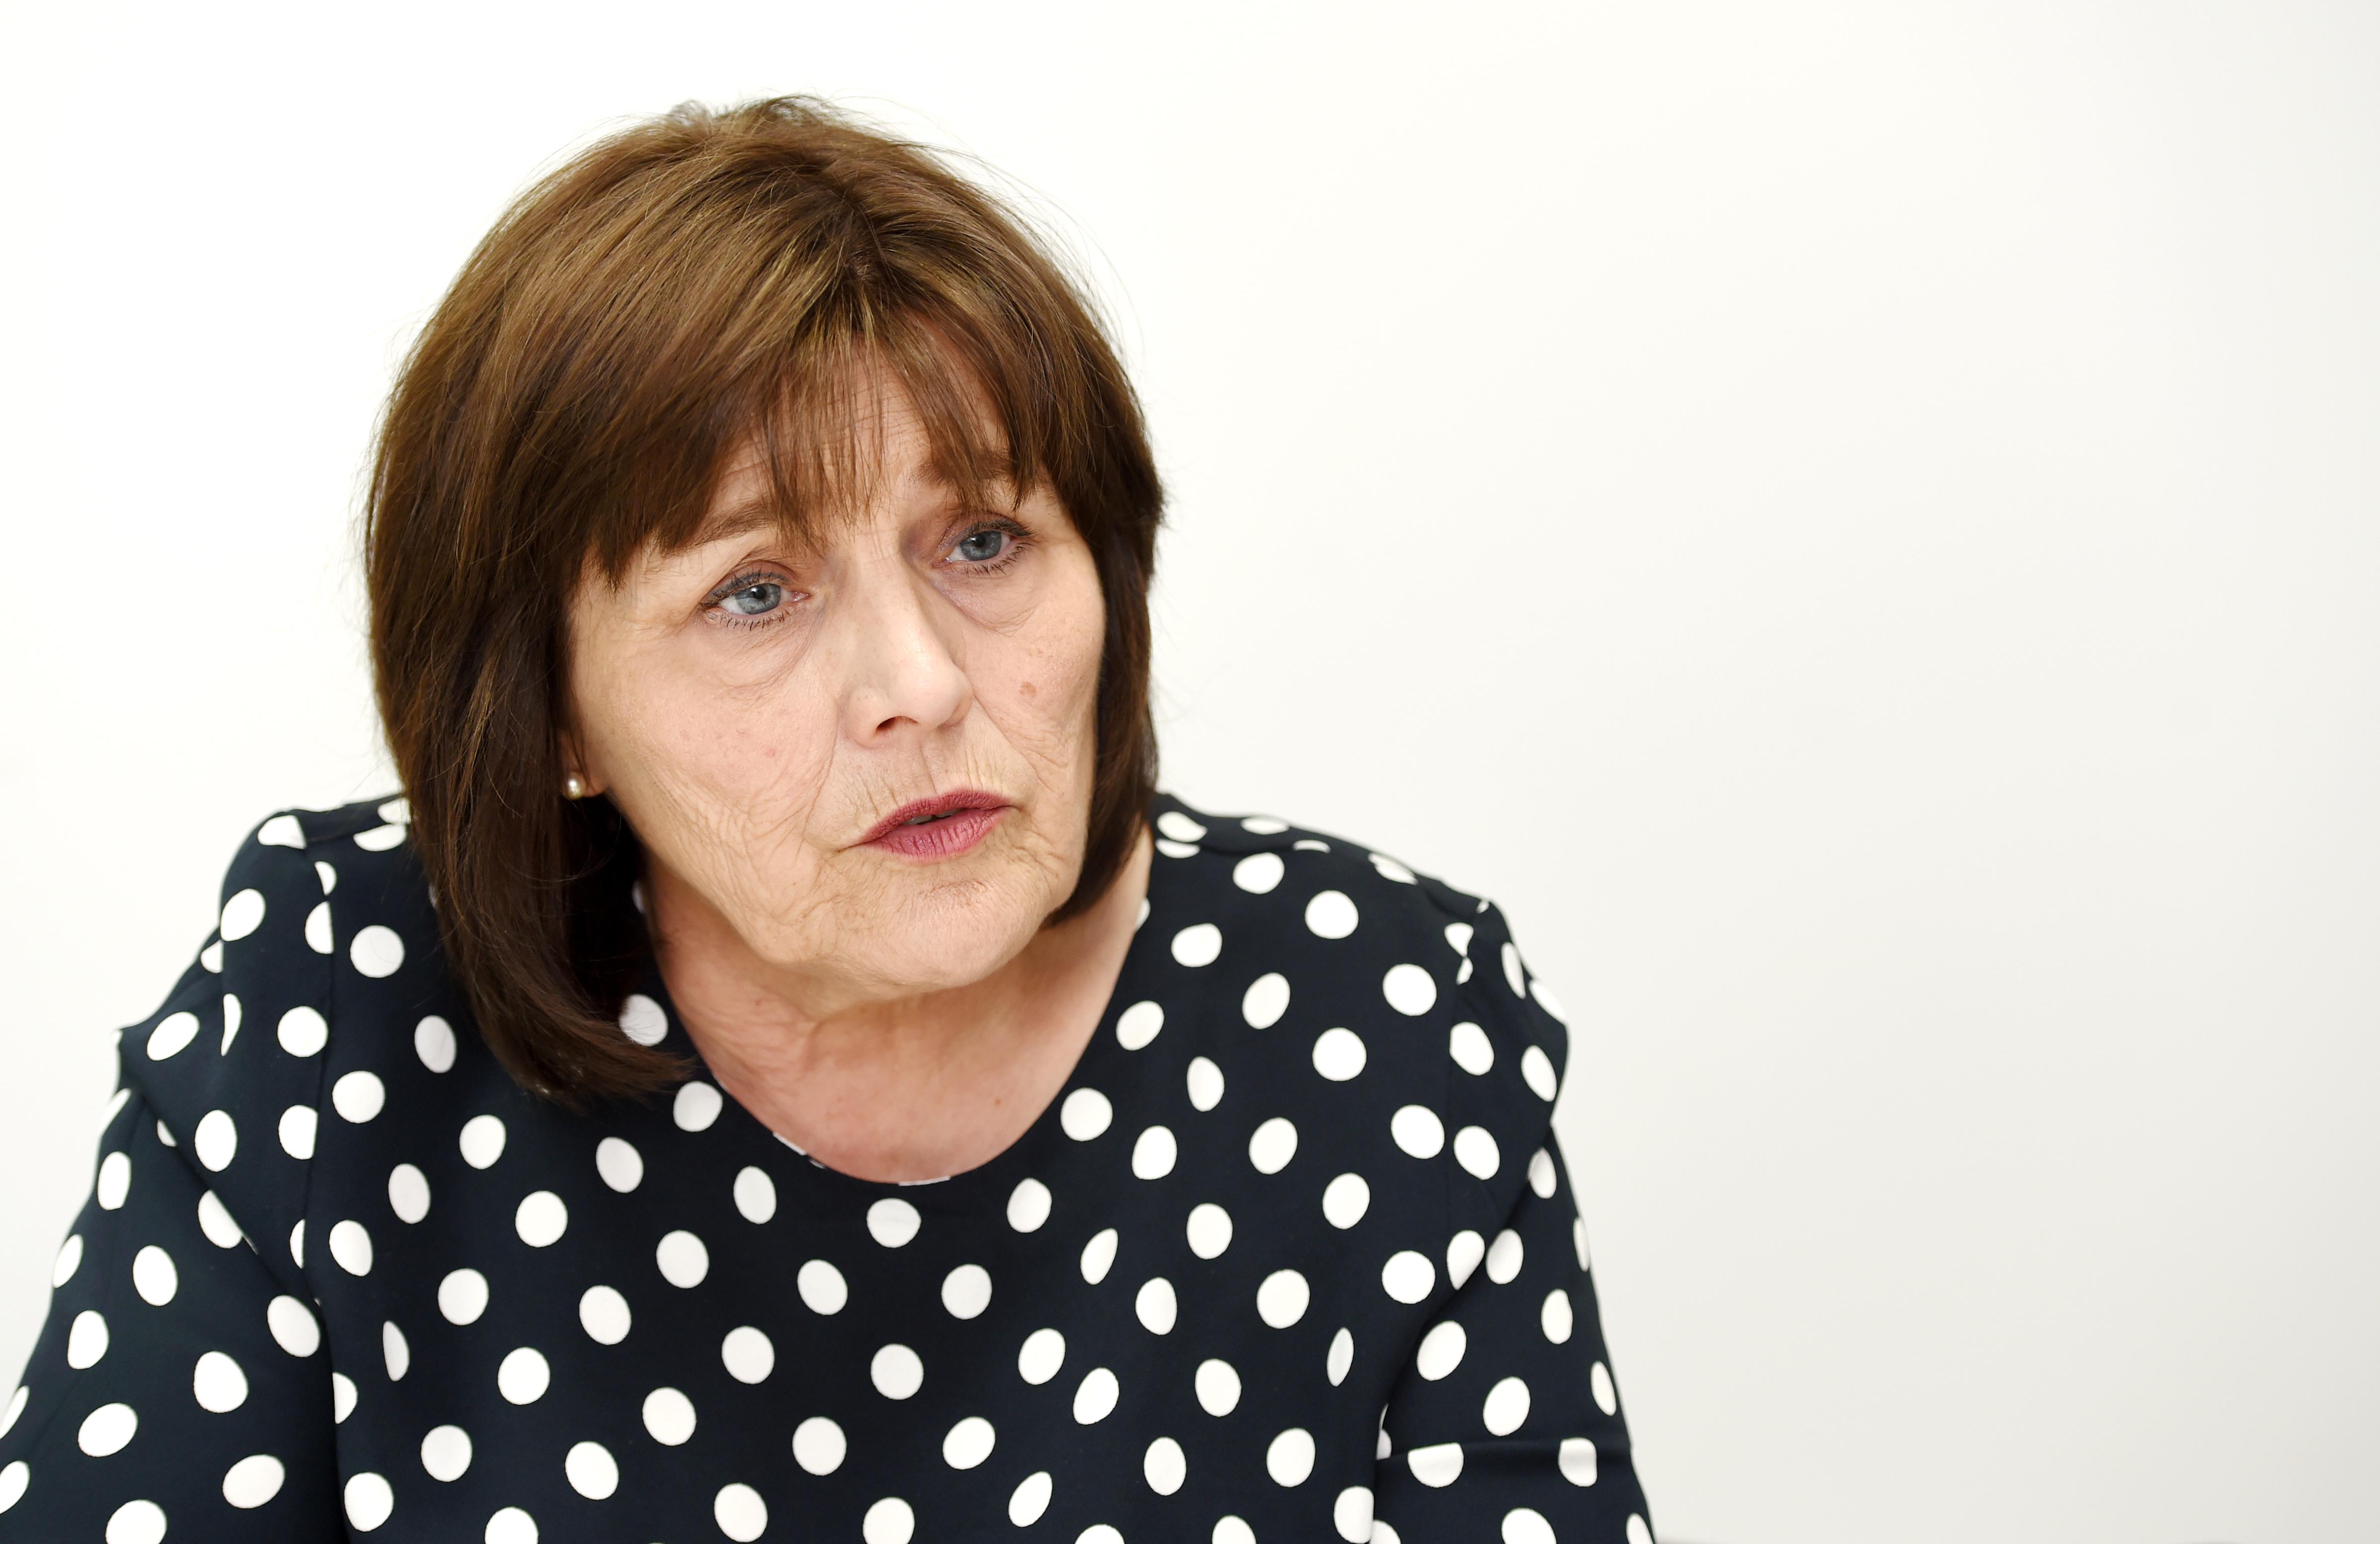 Scottish Health Secretary, Jeane Freeman. Picture by Sandy McCook.